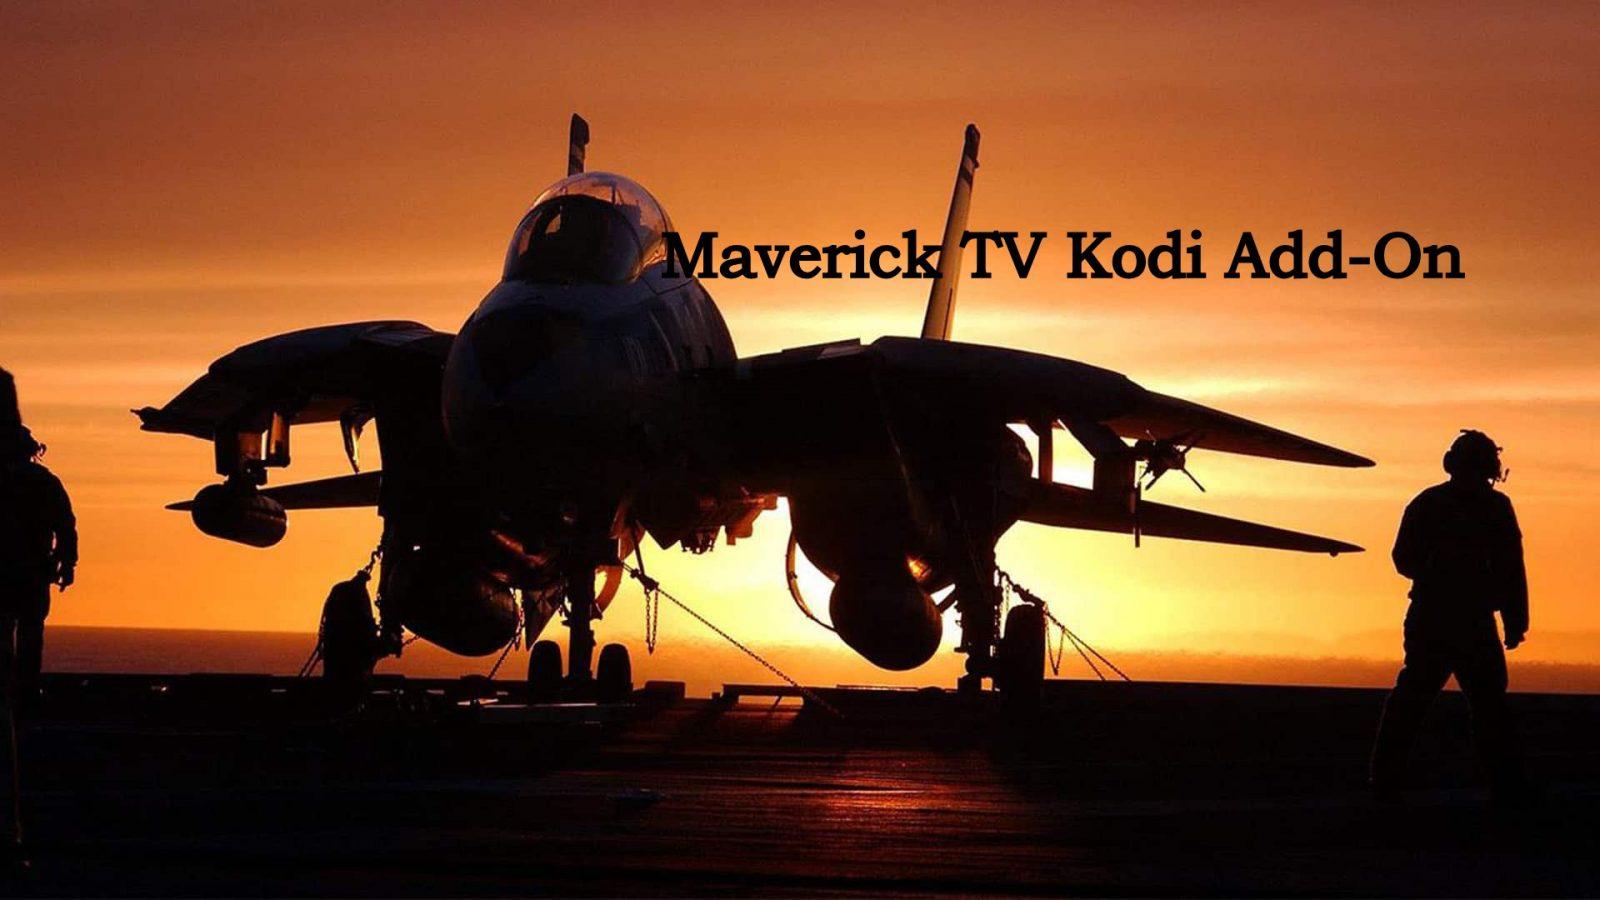 Maverick TV Kodi Addon - Installation Guide with Screenshots and FAQs